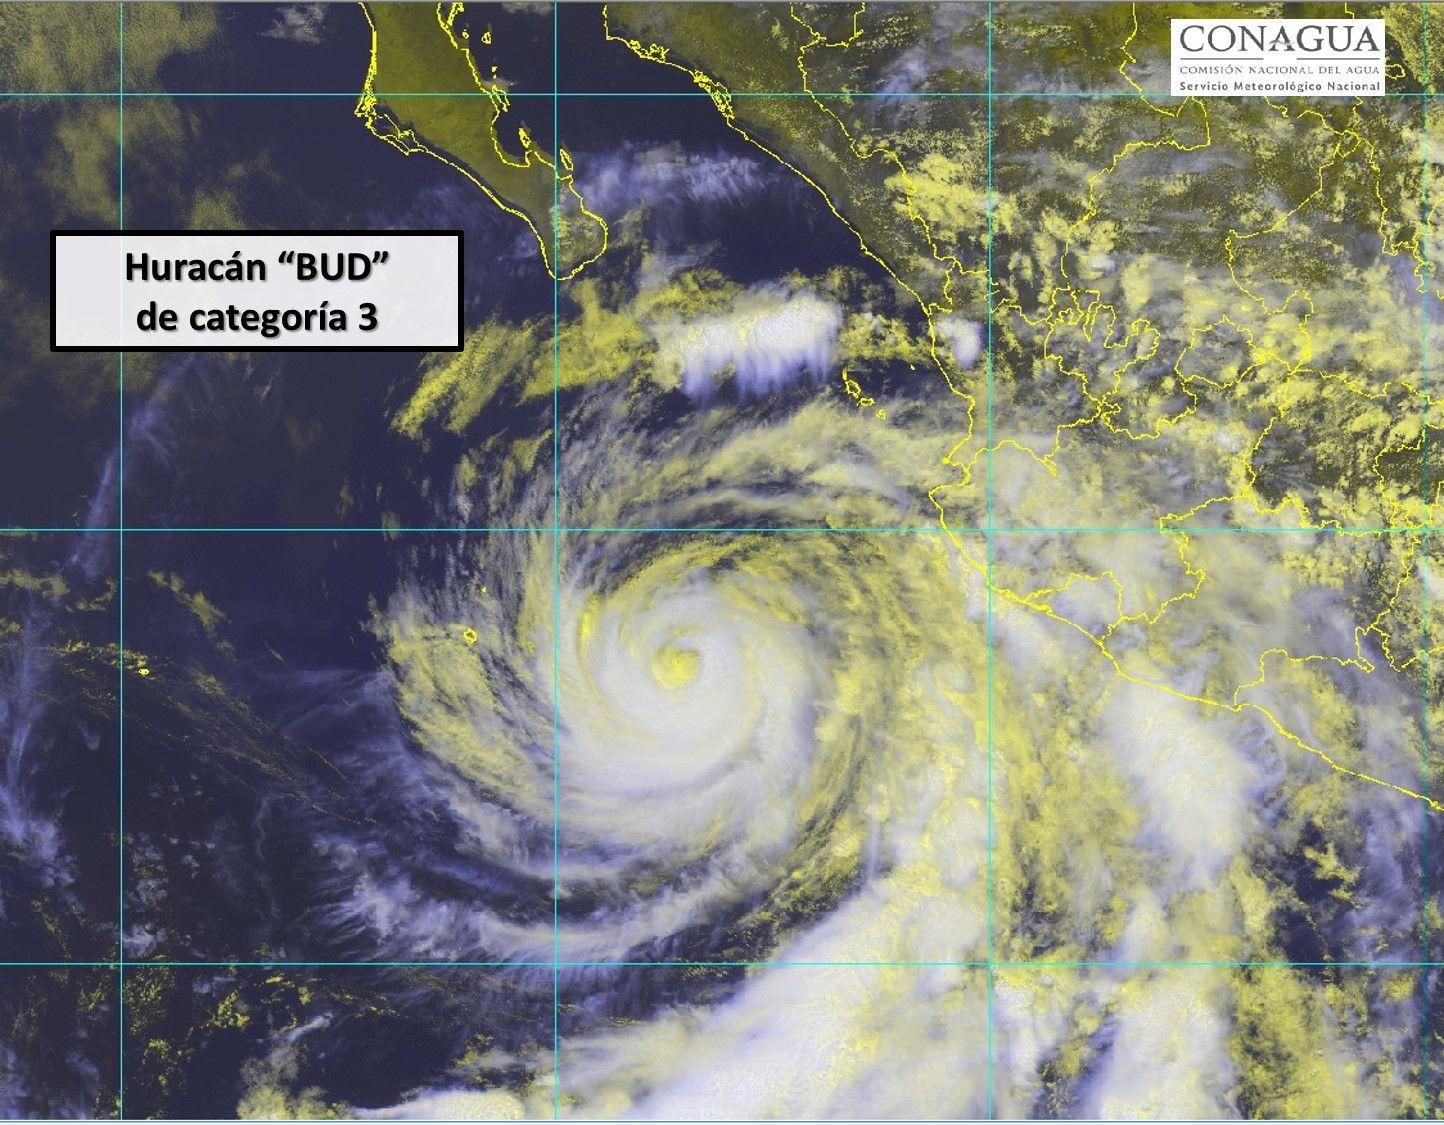 huracán bud categoria 3 aviso 24